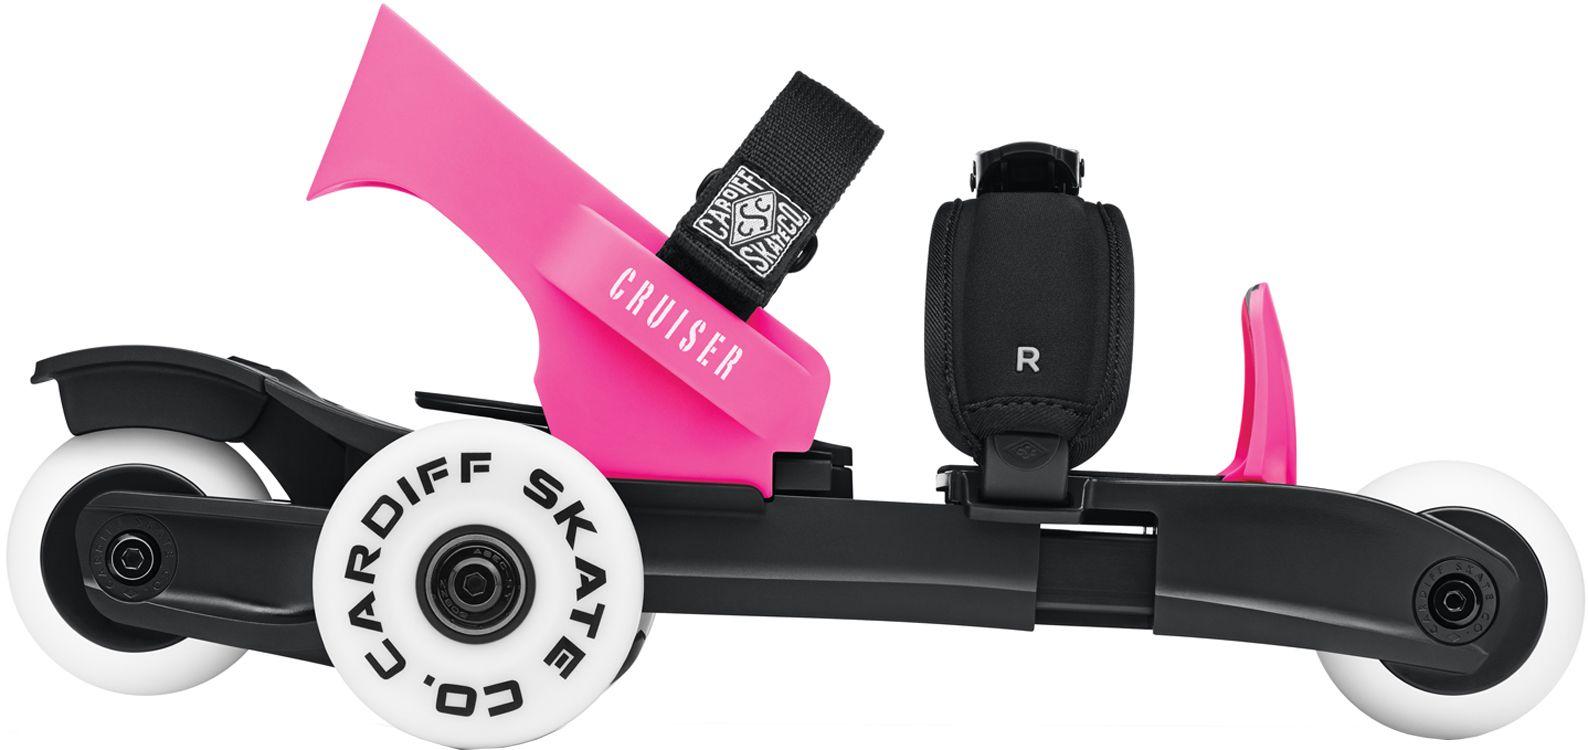 Roller skates adjustable - Cardiff Skate Company Kids Cruiser Adjustable Roller Skates